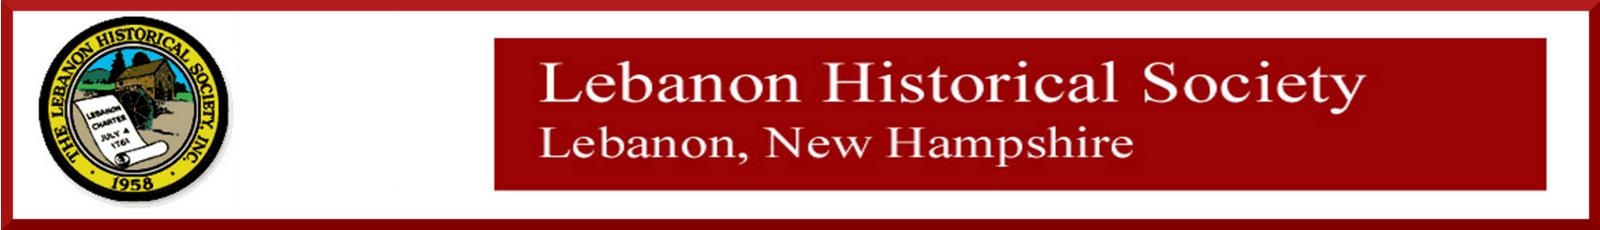 Lebanon Historical Society